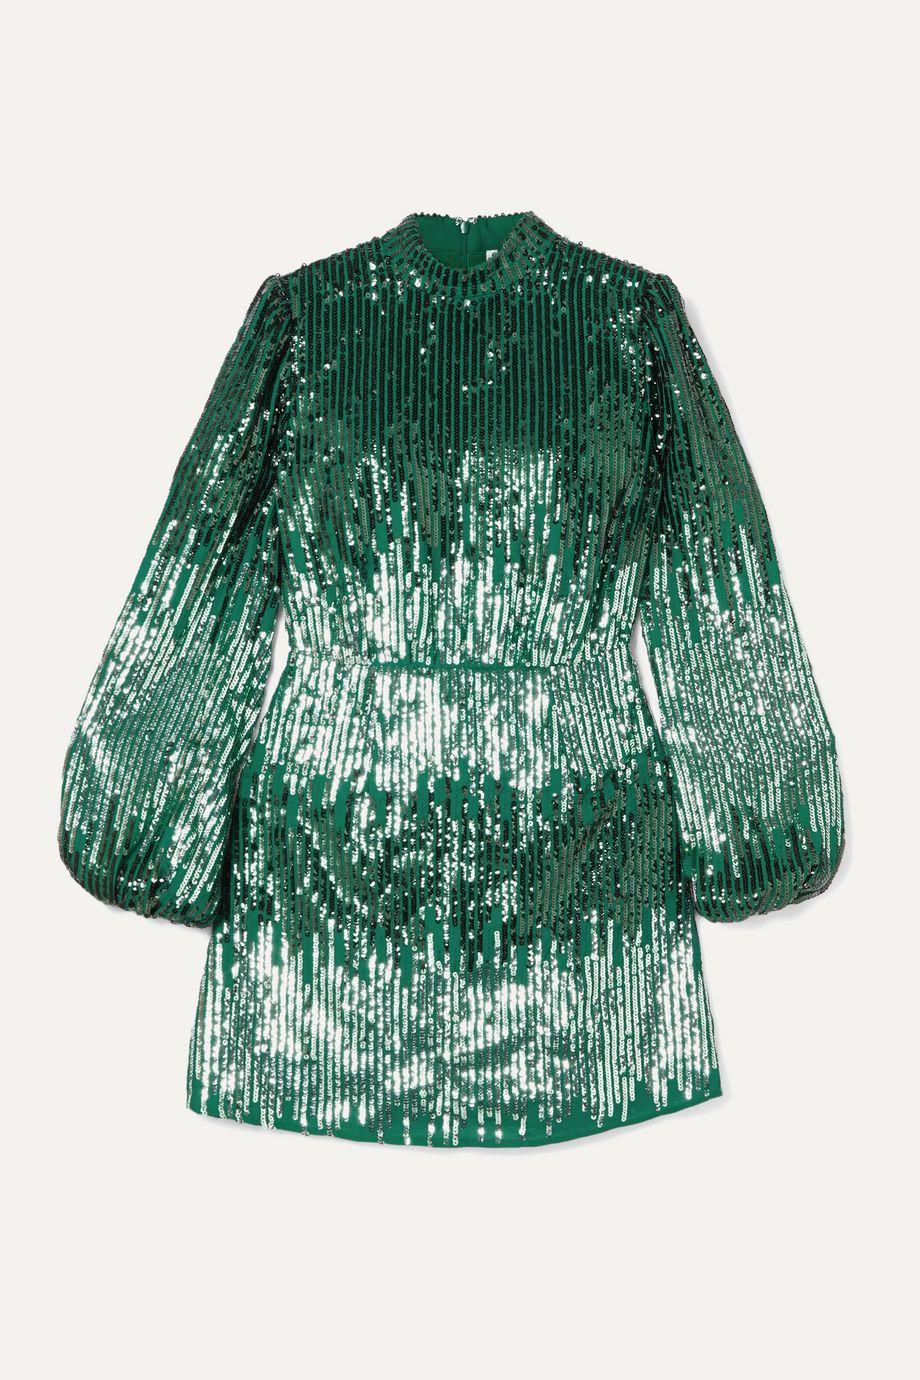 RIXO Samantha sequined crepe mini dress